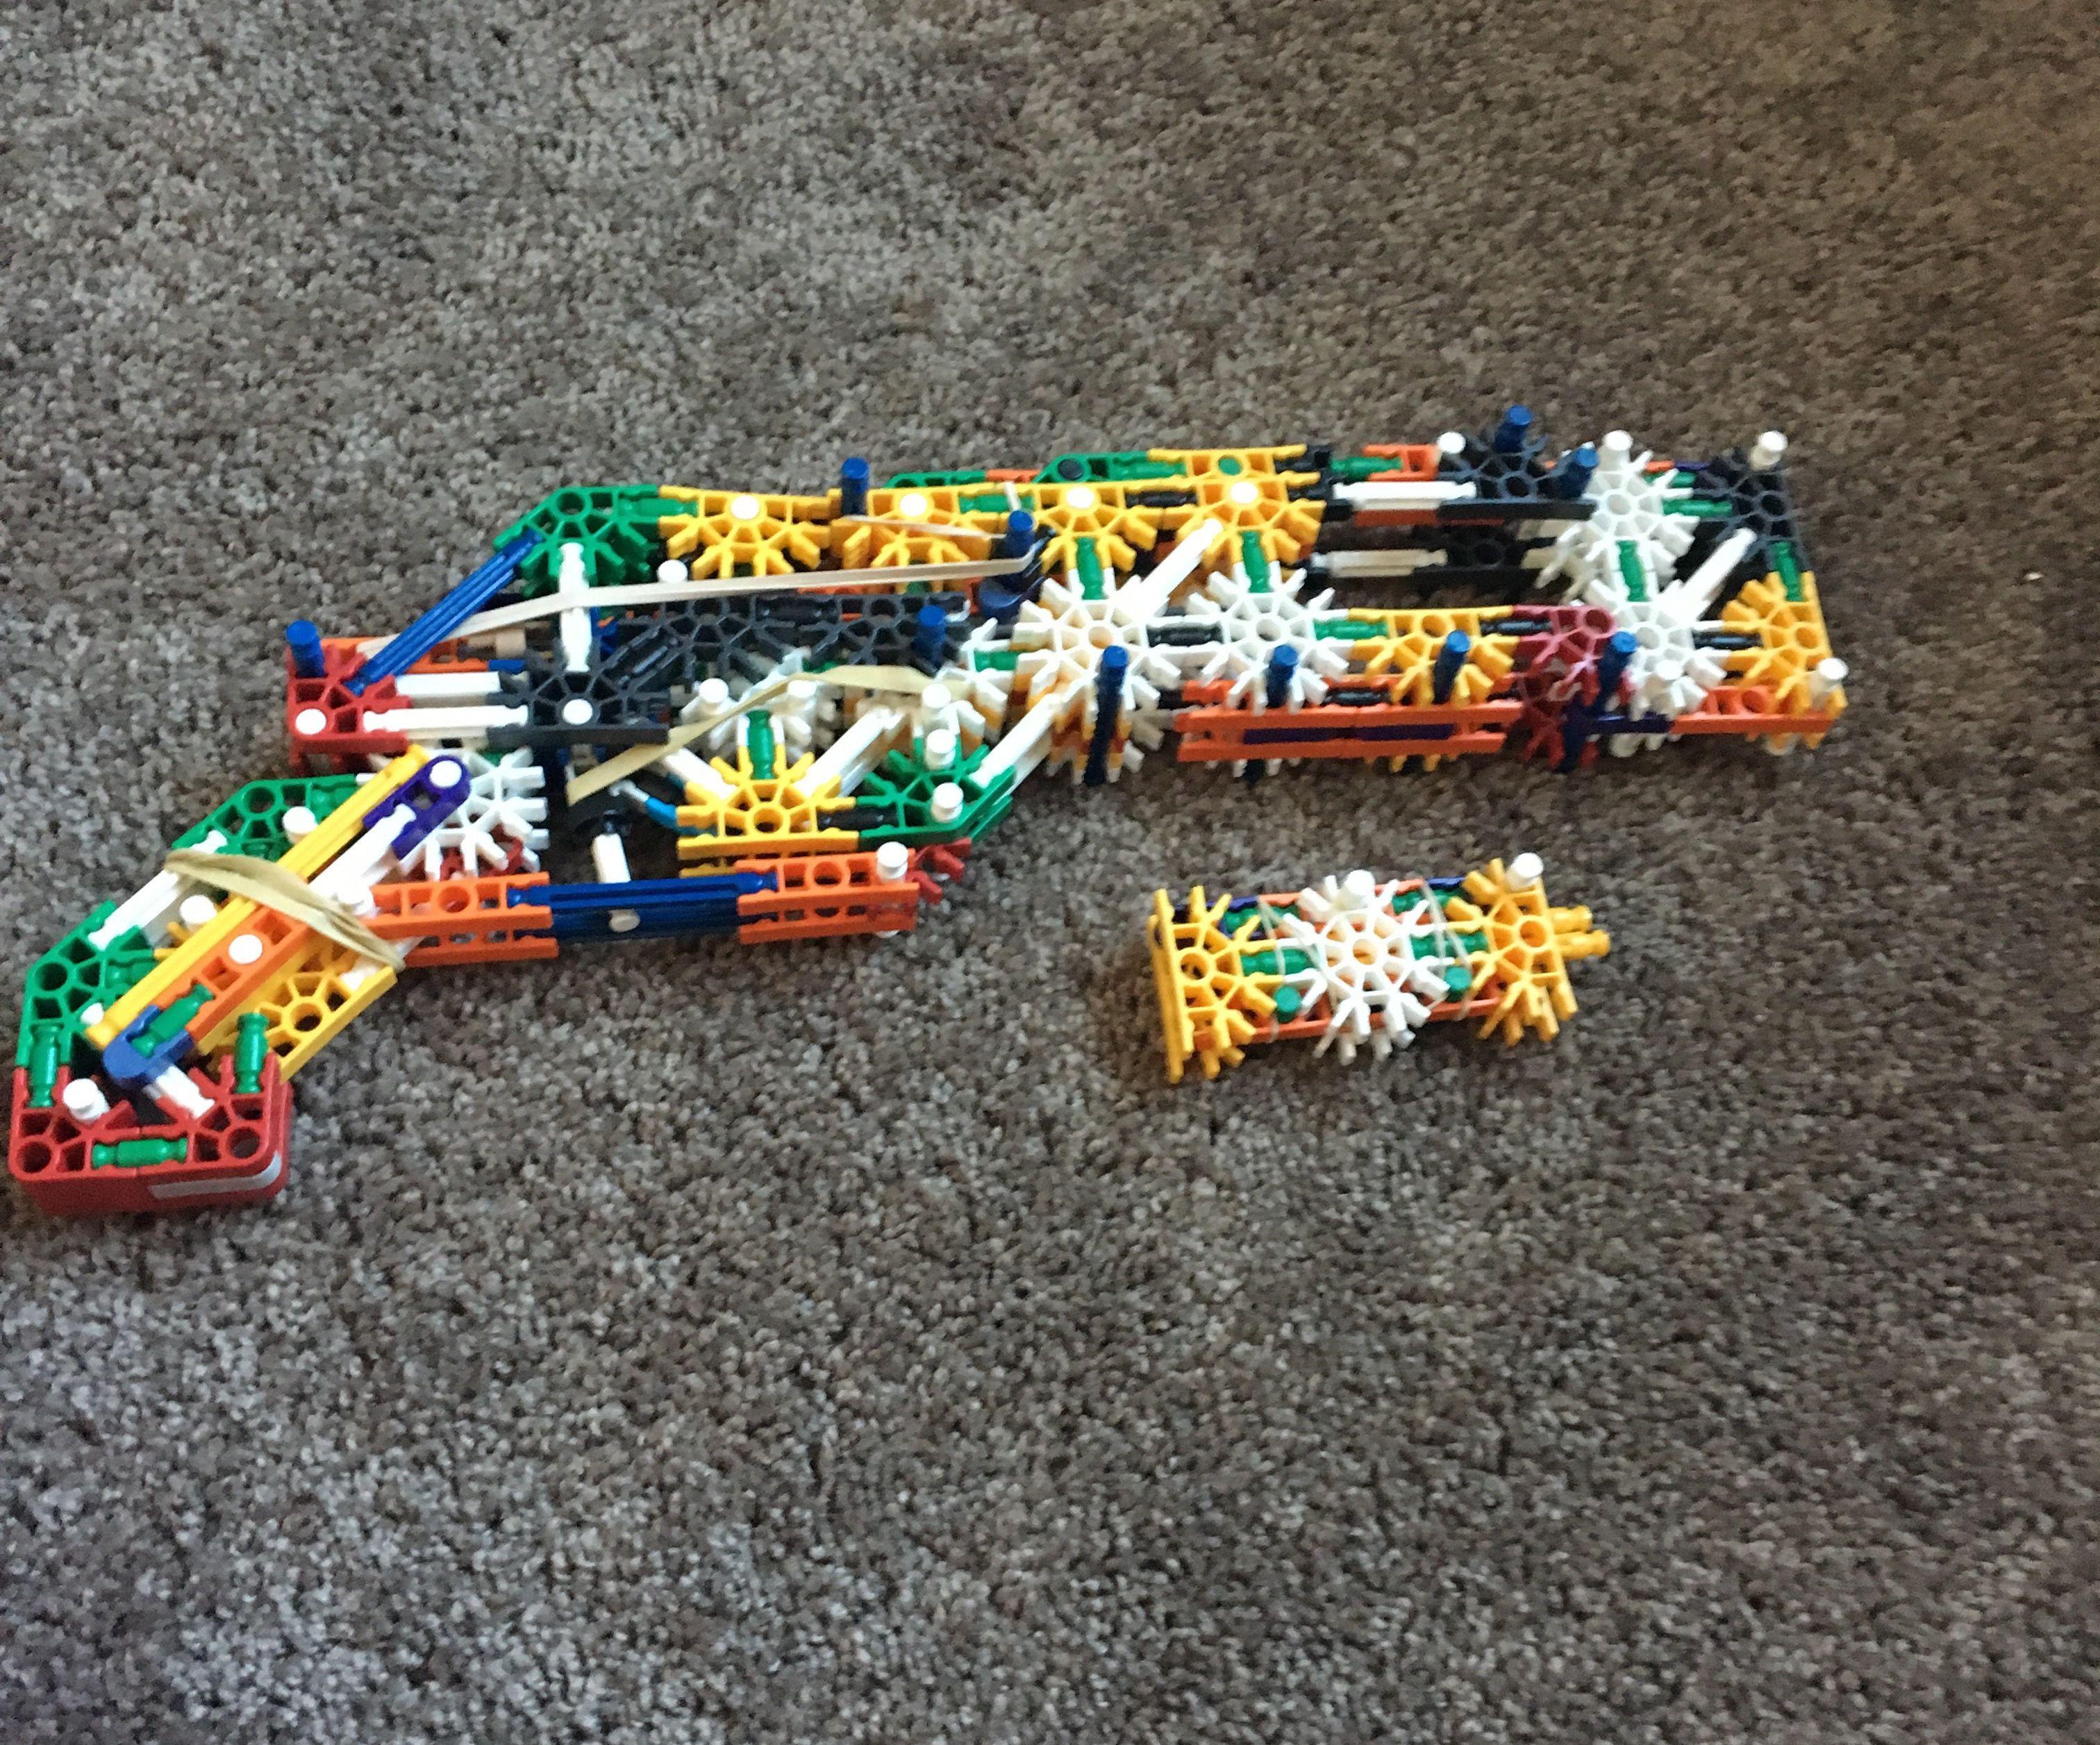 Knex Sawn Off Shotgun V2